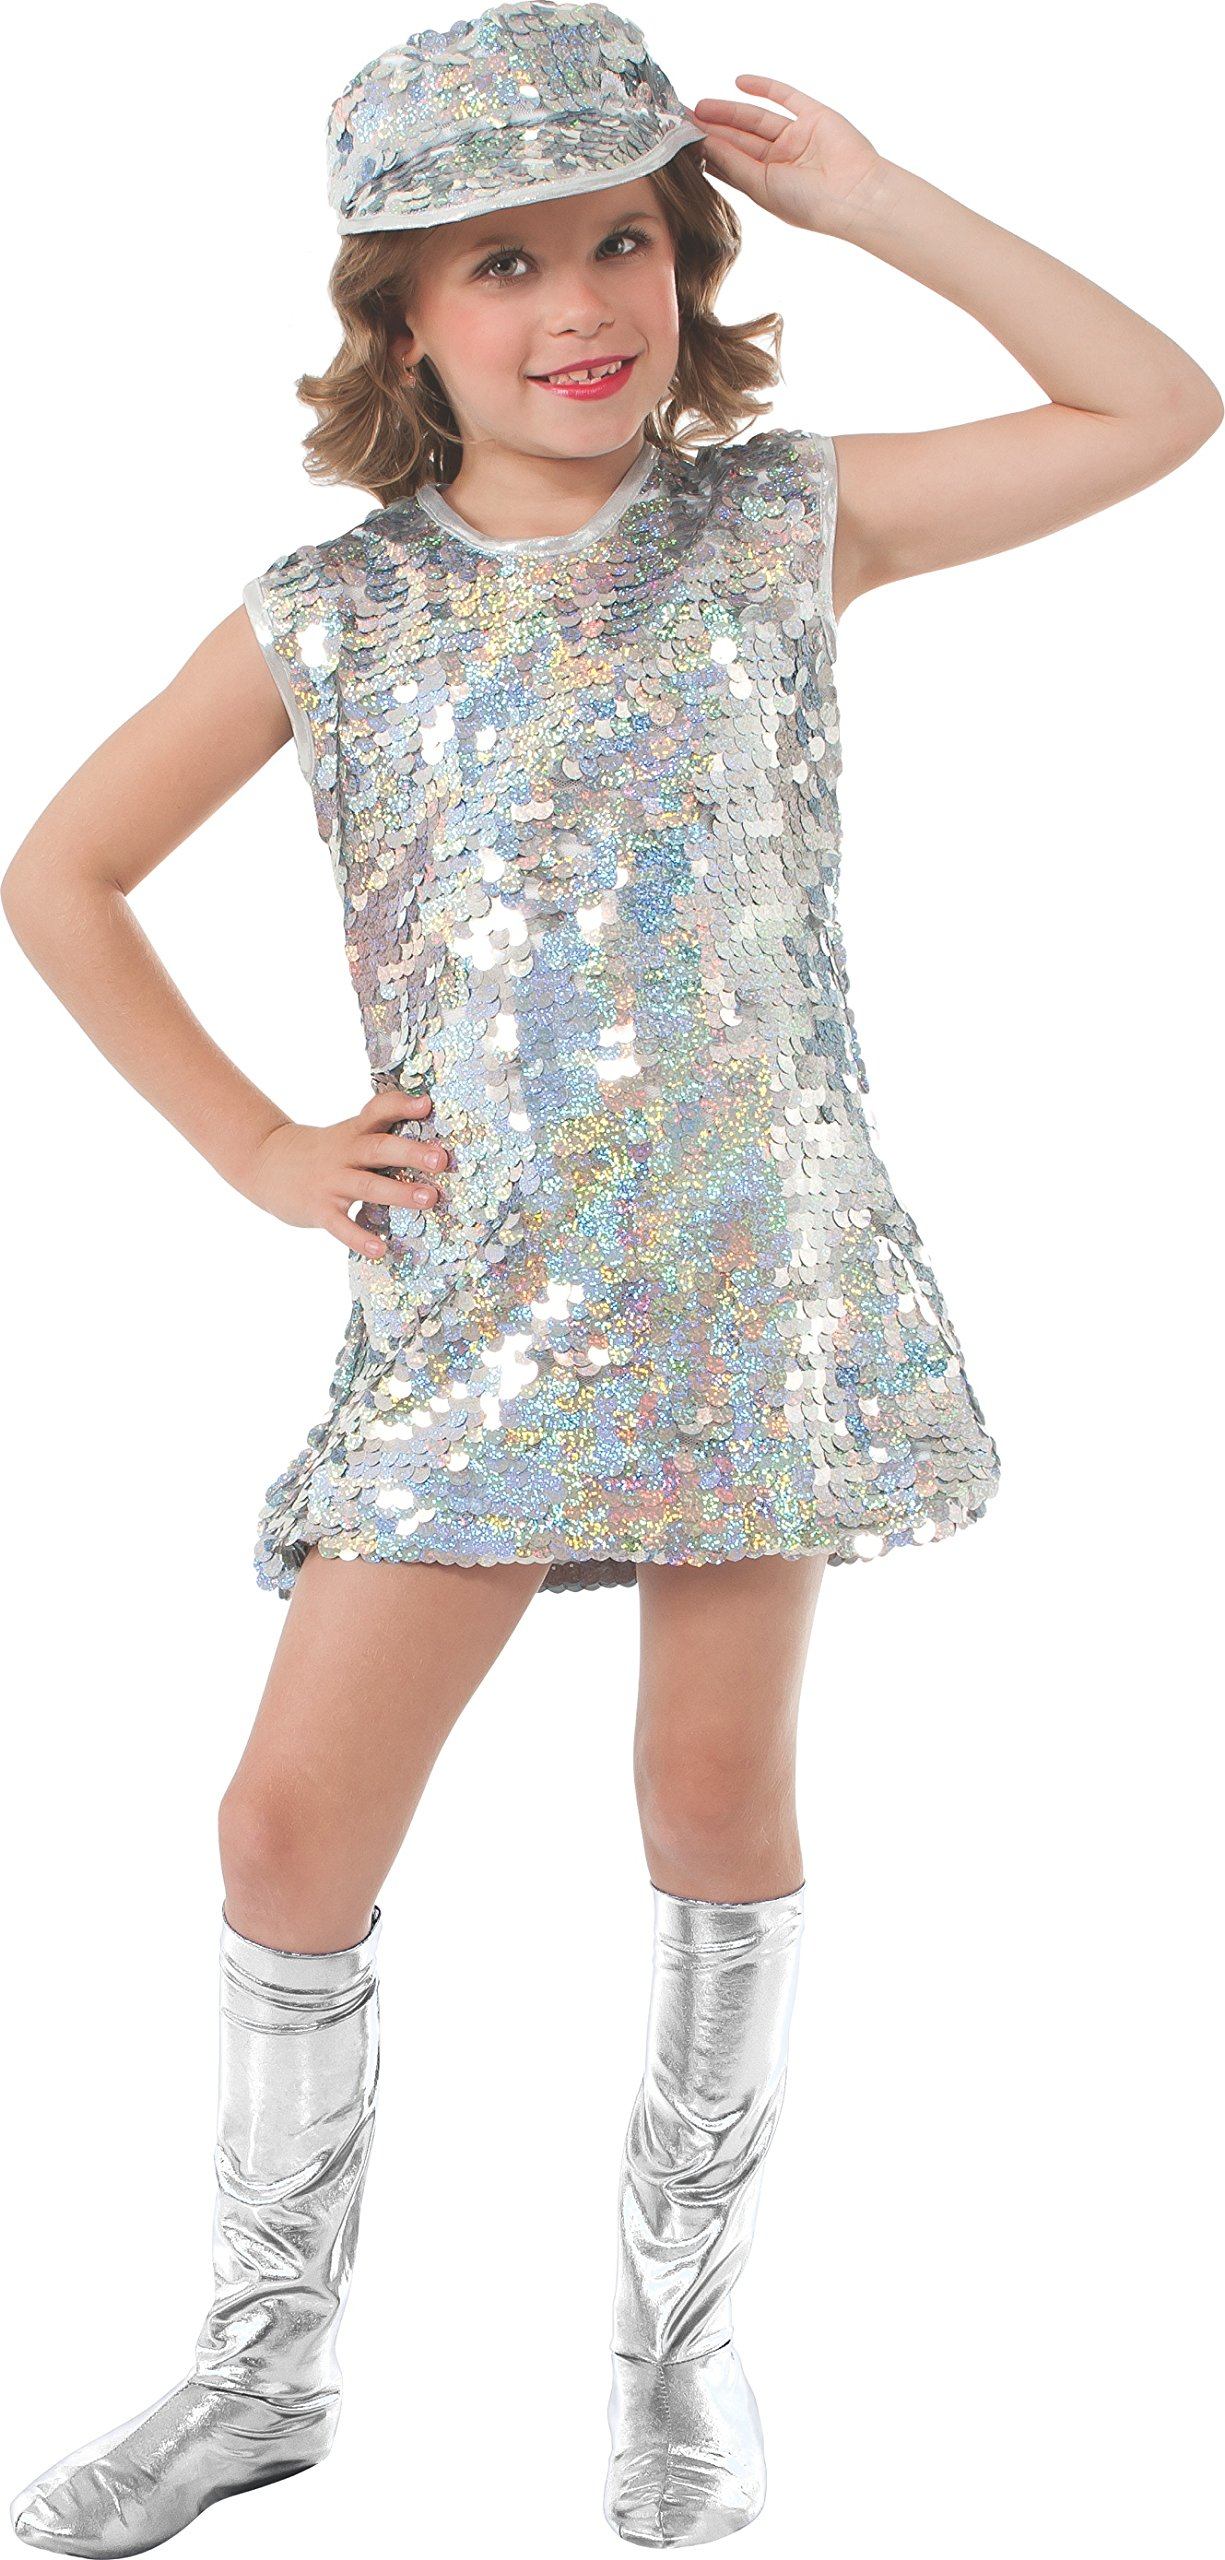 Rubie's Silver Mod Girl Costume, Child Small